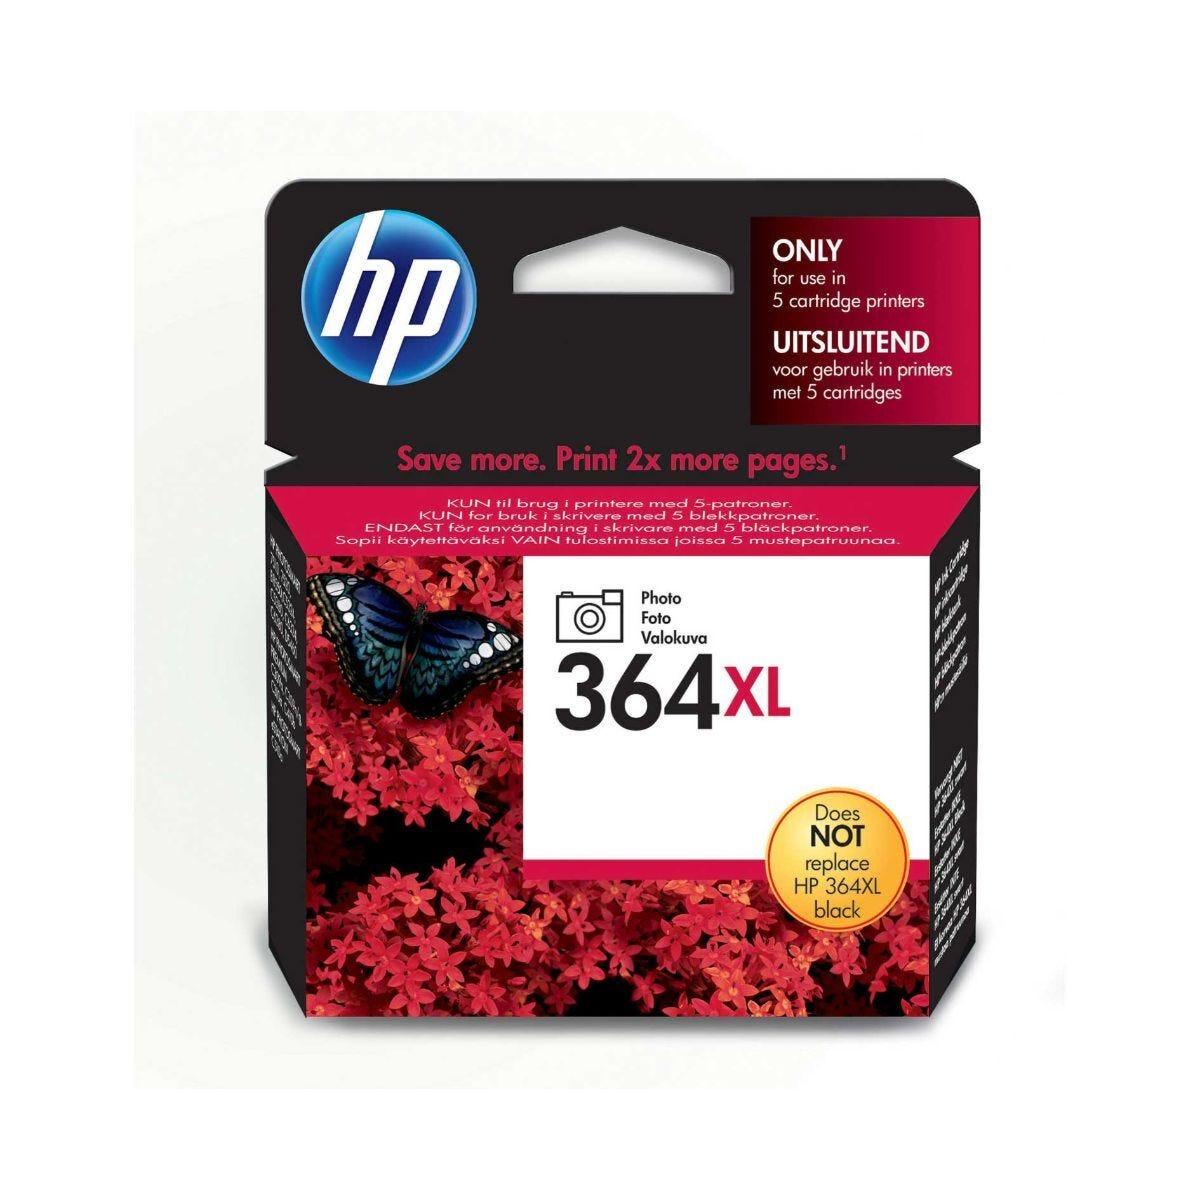 HP 364XL Photo Inkjet Cartridge